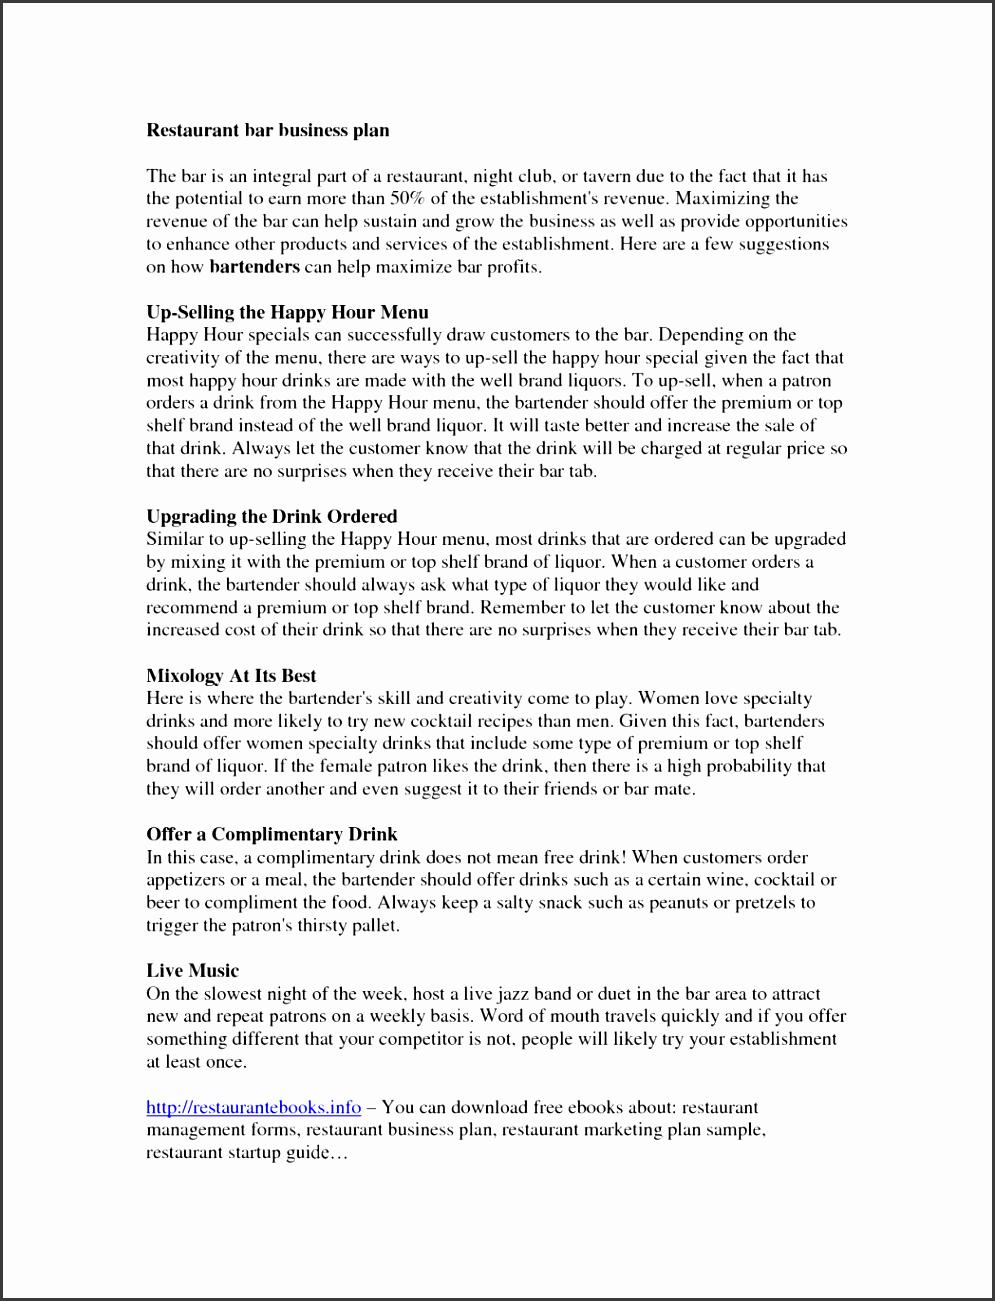 business proposal letter sample for restaurant images letter sample product proposal letter free invitation design templates